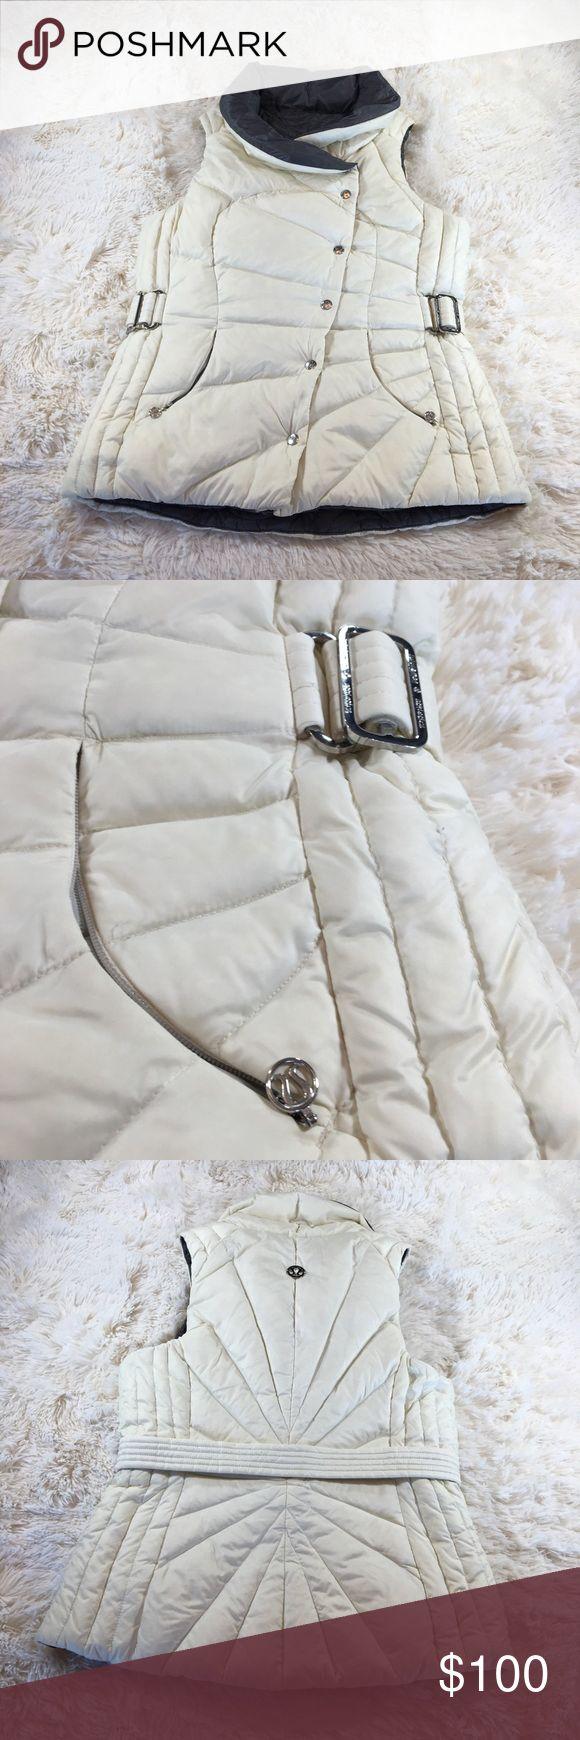 Lululemon Athletica Vest Lululemon Athletica Vest button up but also zips up. Size 6 color off white.      Box../20 lululemon athletica Jackets & Coats Vests